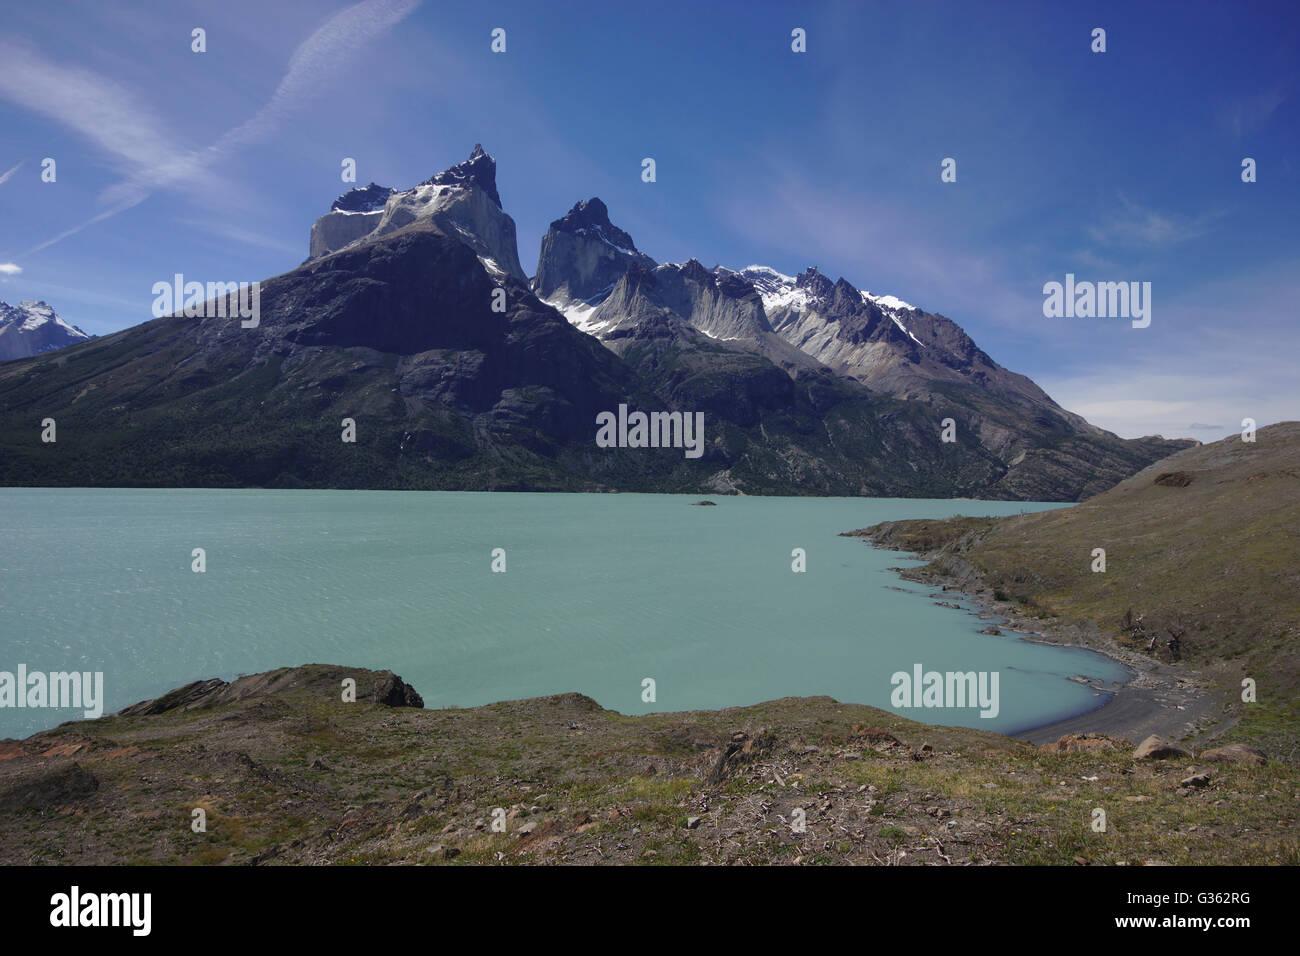 Cuernos del Paine and Lago Nordenskjöld from Mirador Cuernos, Torres del Paine National Park, Chile - Stock Image